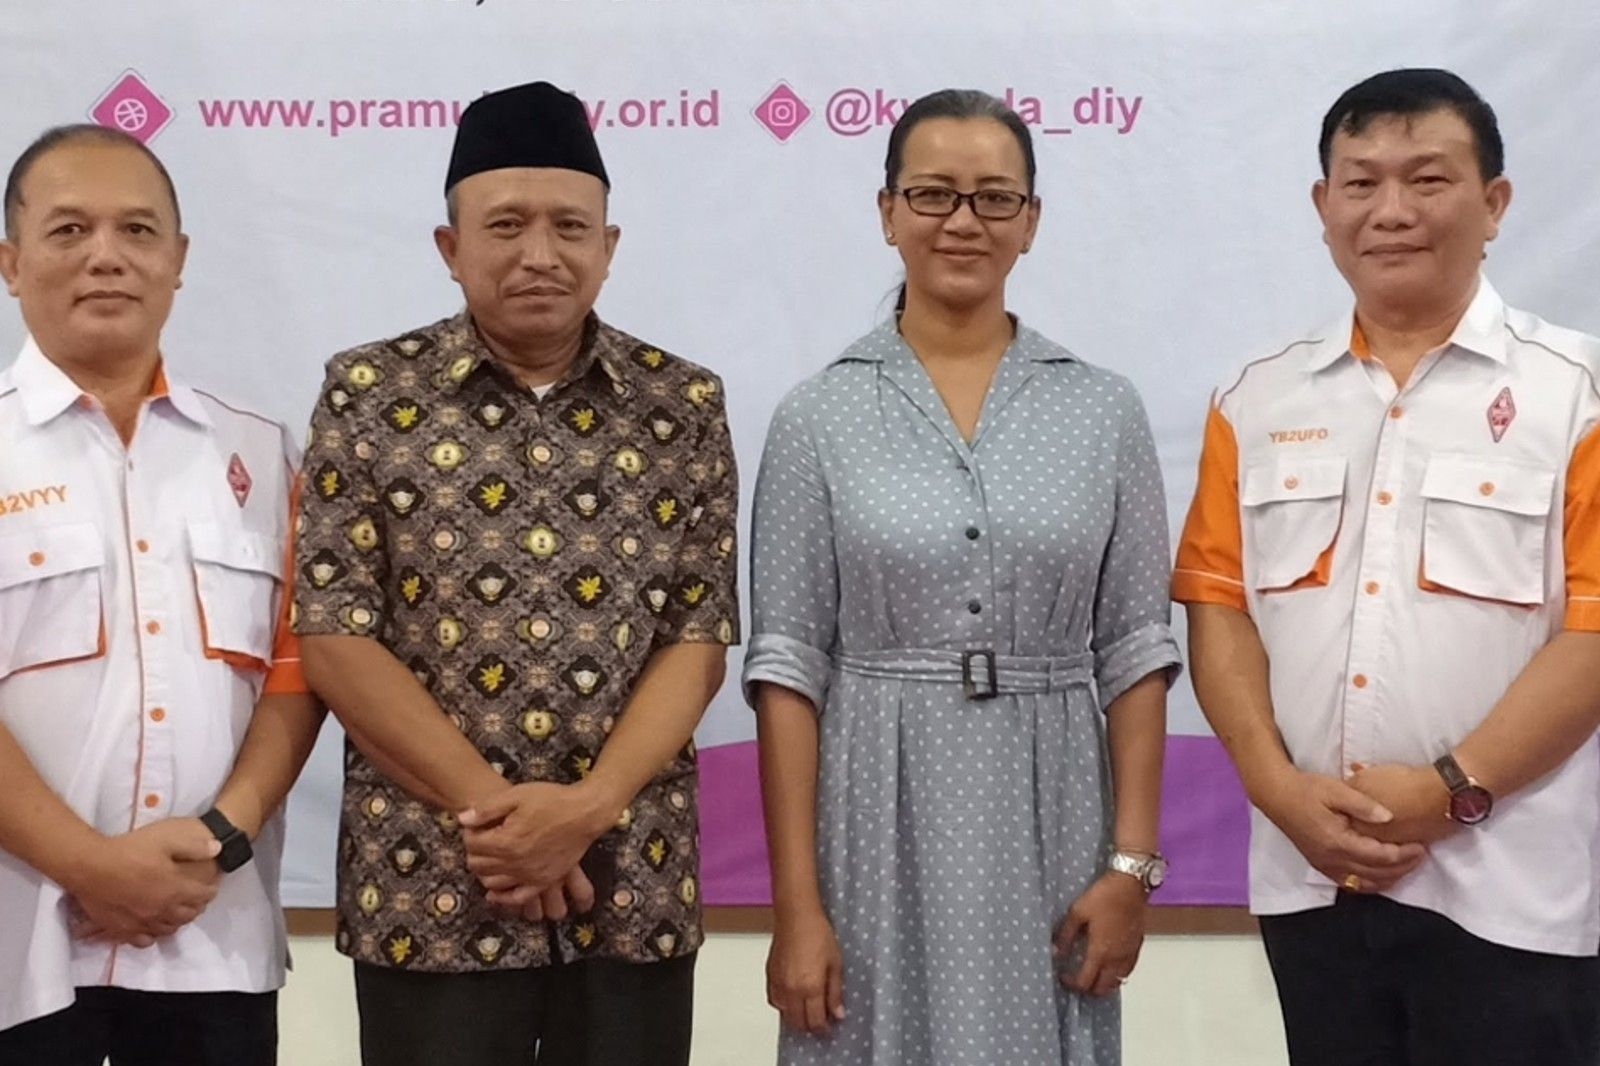 Bersama Ketua Kwarda DIY Gusti Kanjeng Ratu Mangkubumi